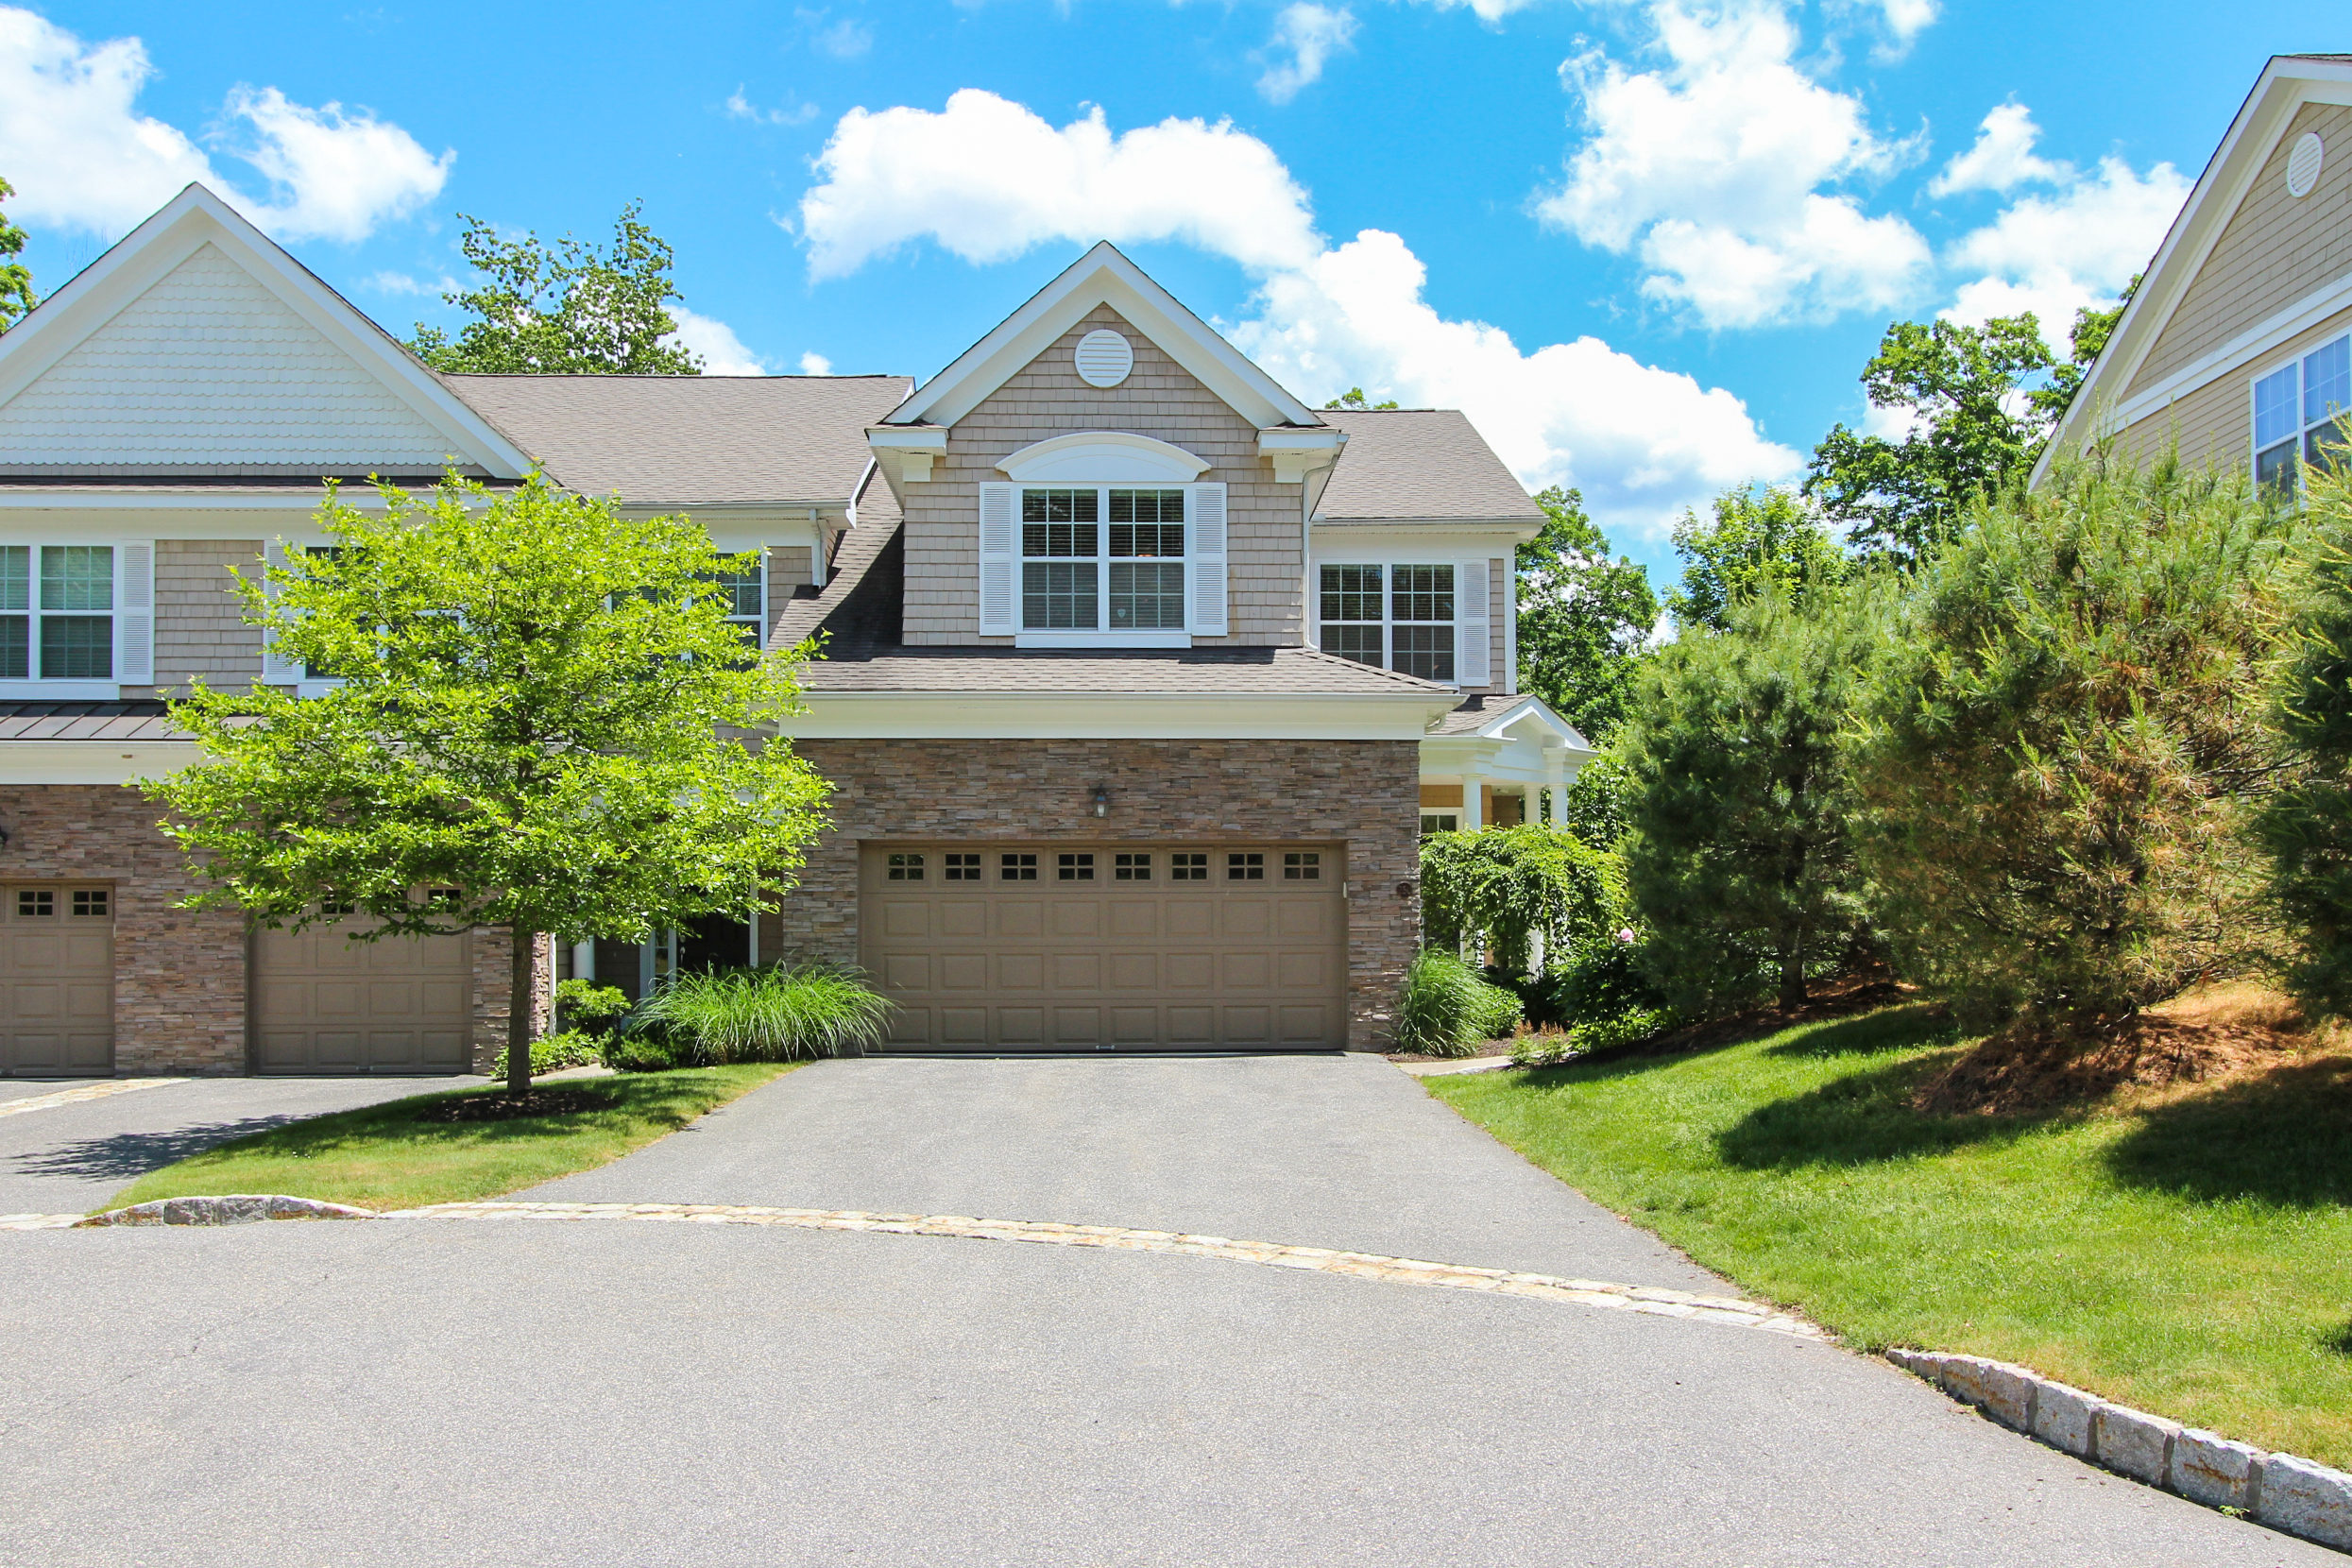 独户住宅 为 销售 在 Meticulously Designed Townhouse on 77 Acres 250 Hunter 250 利奇菲尔德, 康涅狄格州, 06759 美国